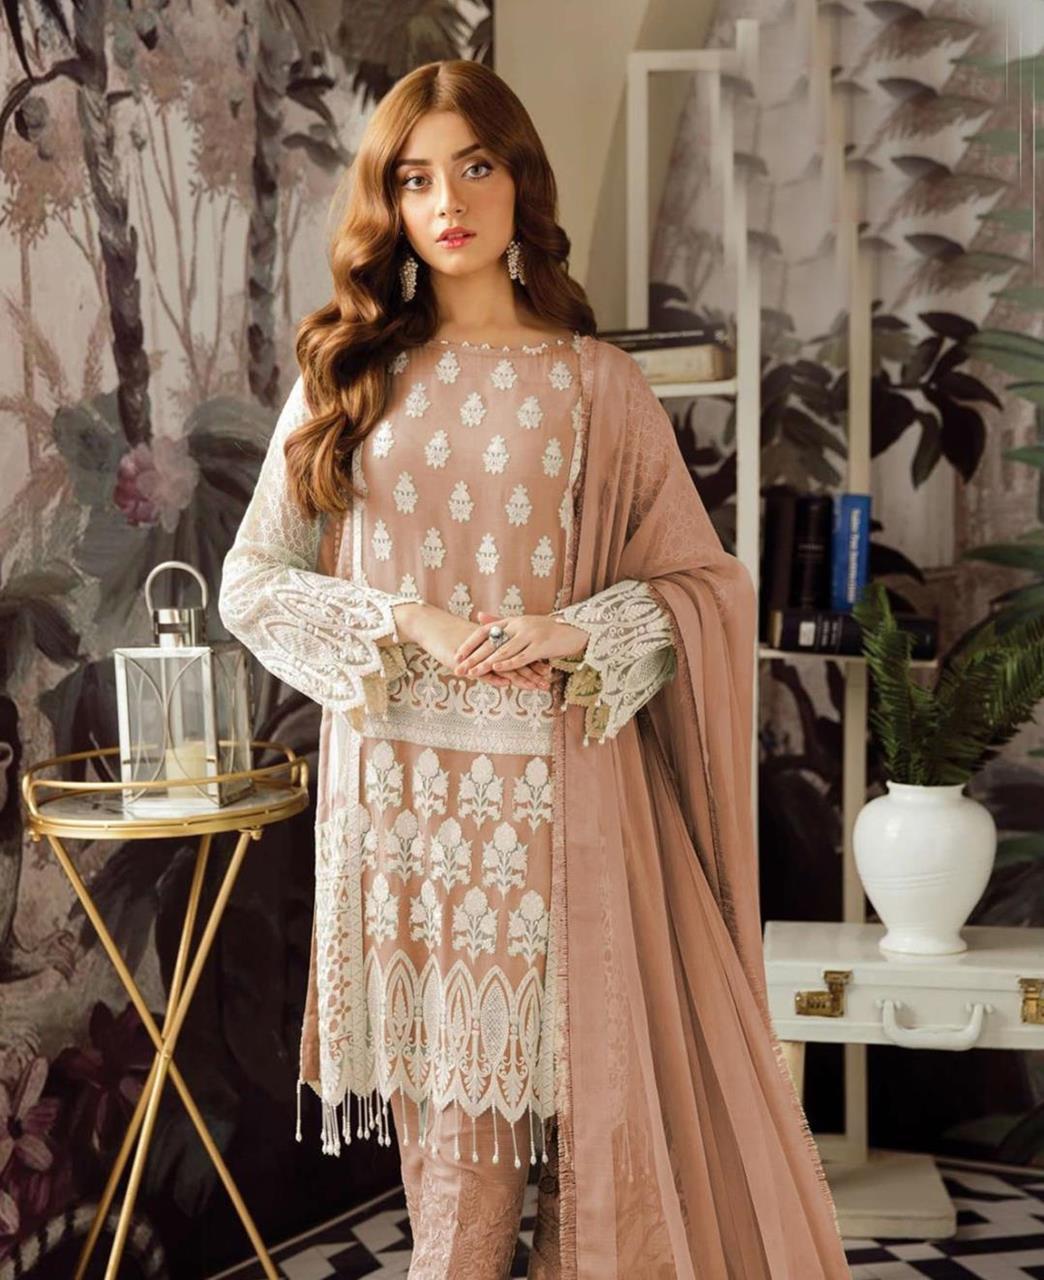 Embroidered Georgette Straight cut Salwar Kameez in Light Brown